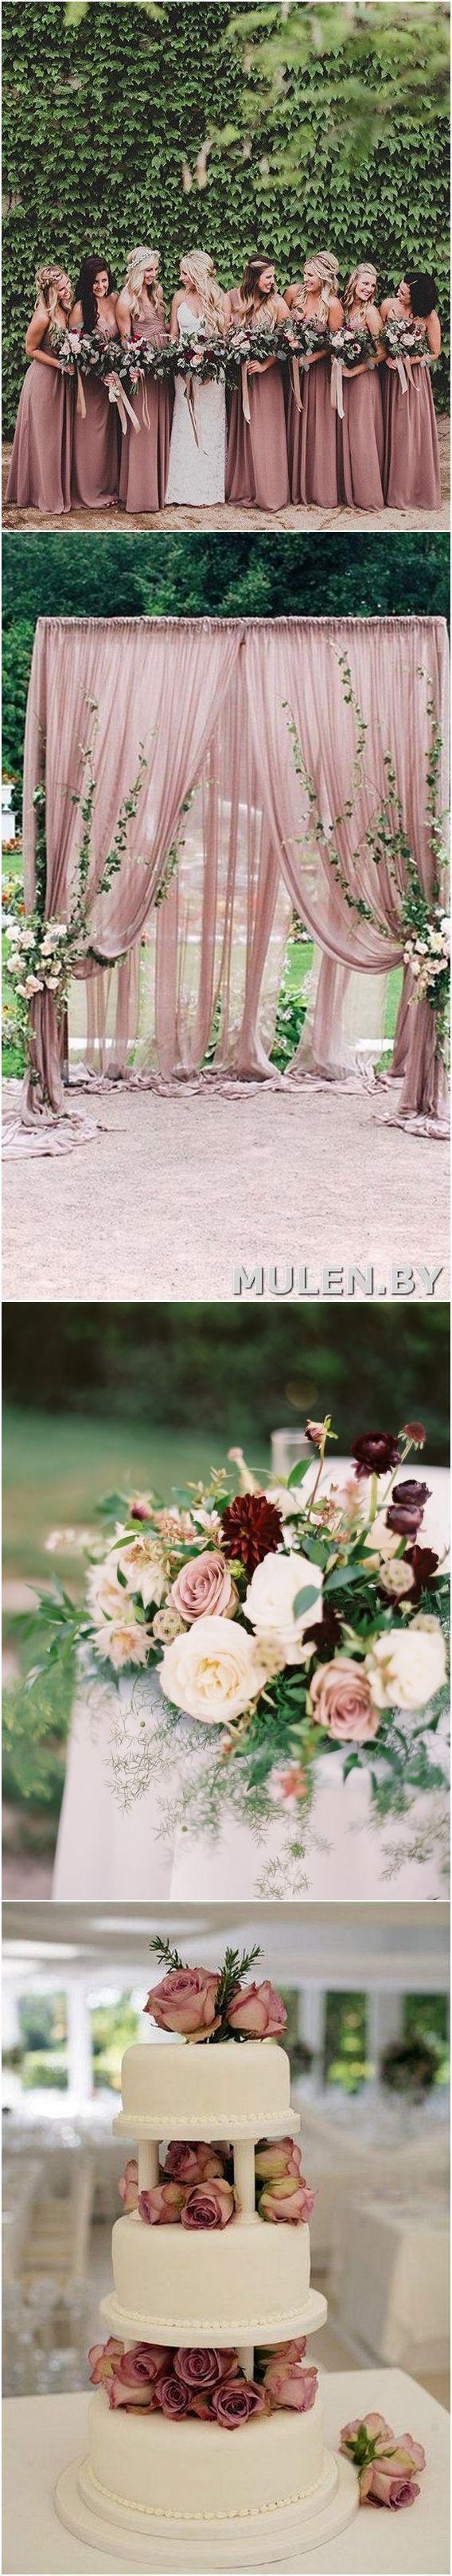 Wedding Ideas 15 Best Photos – Wedding Dress …